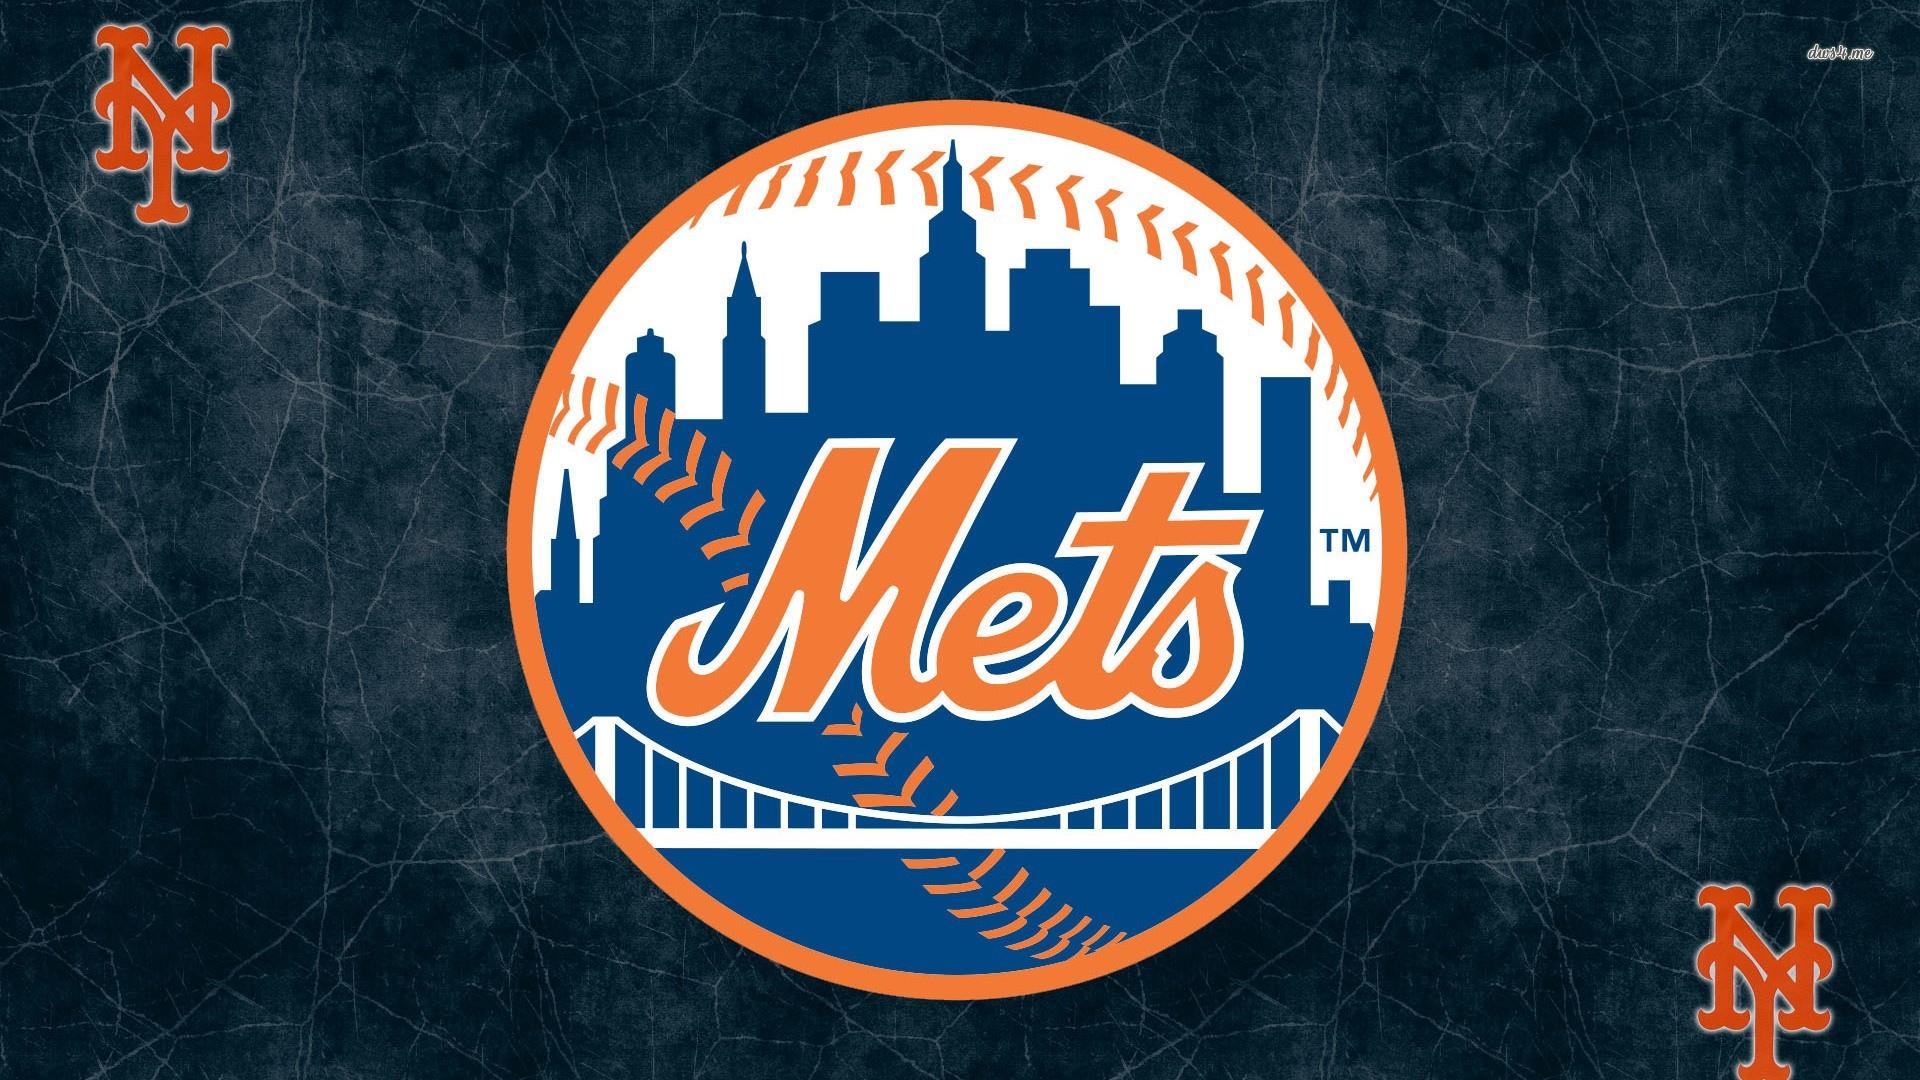 New York Mets Wallpaper: NY Mets Wallpaper Mlb (69+ Images